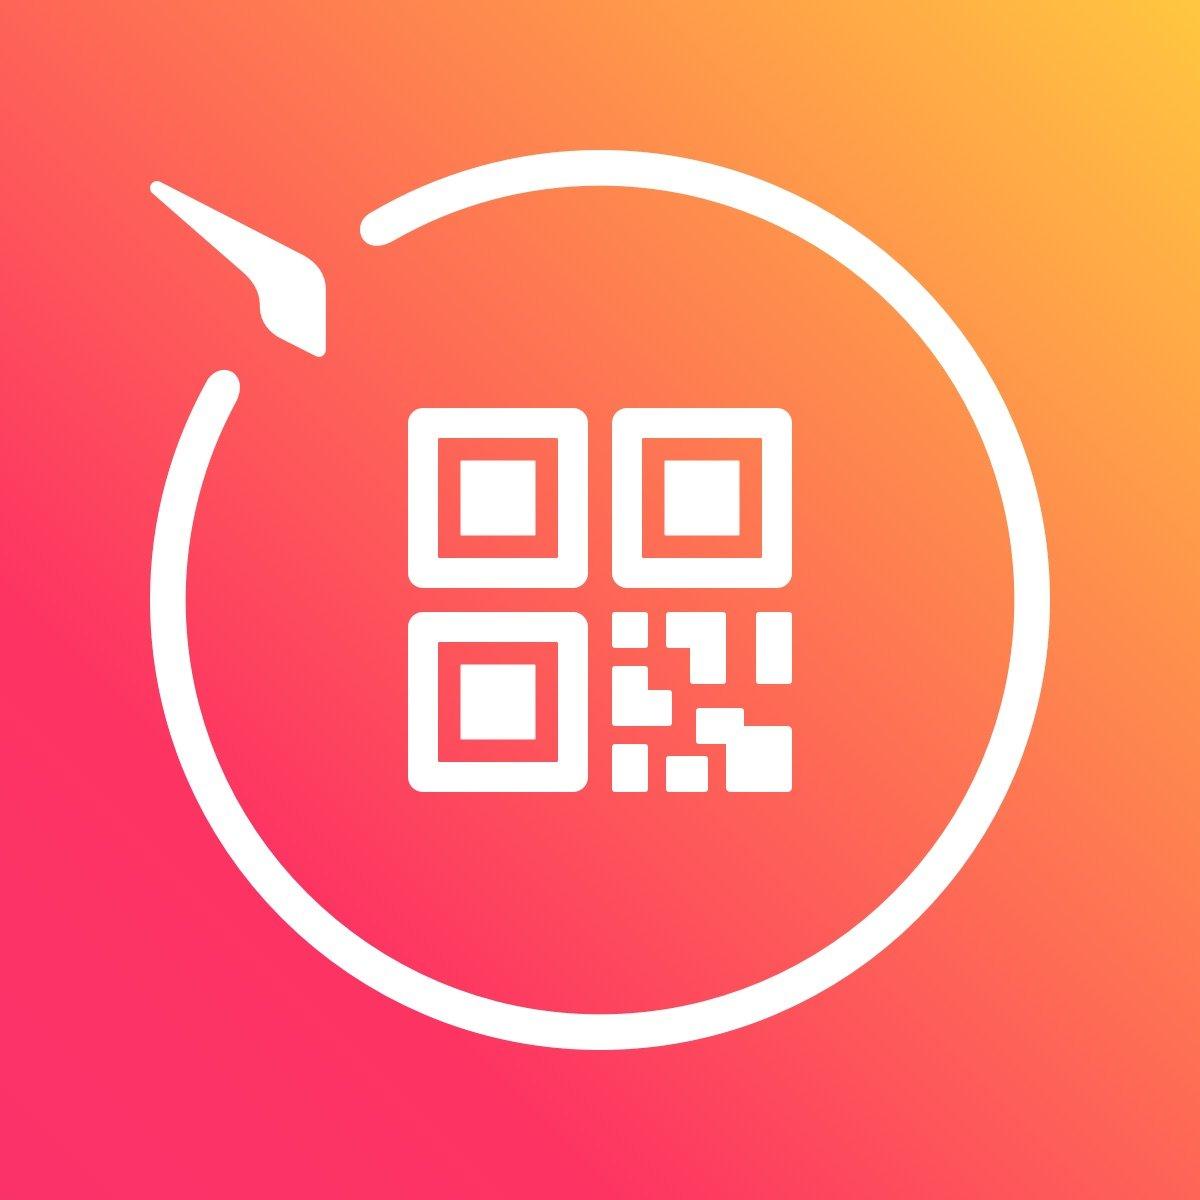 Shopify QR Code Generator Apps by Elfsight